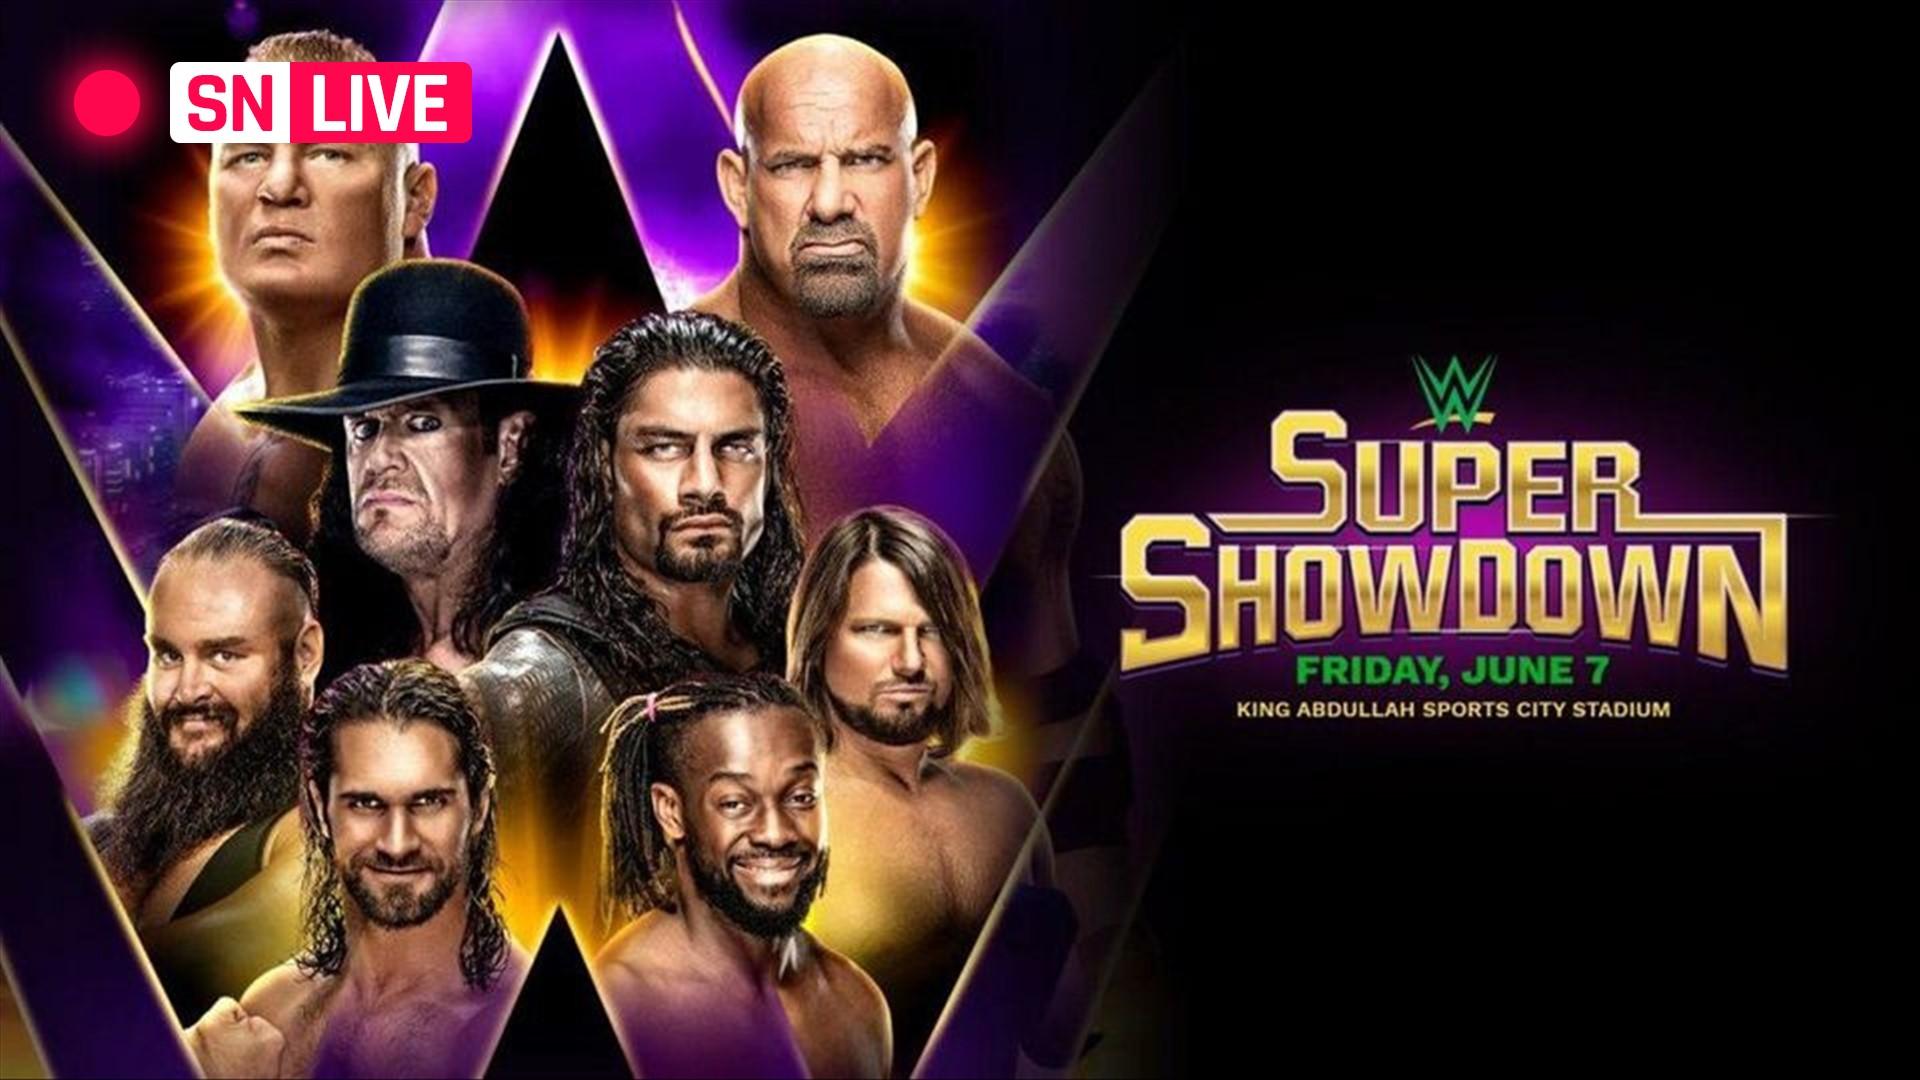 WWE Super ShowDown 2019 results, live updates, matches, predictions